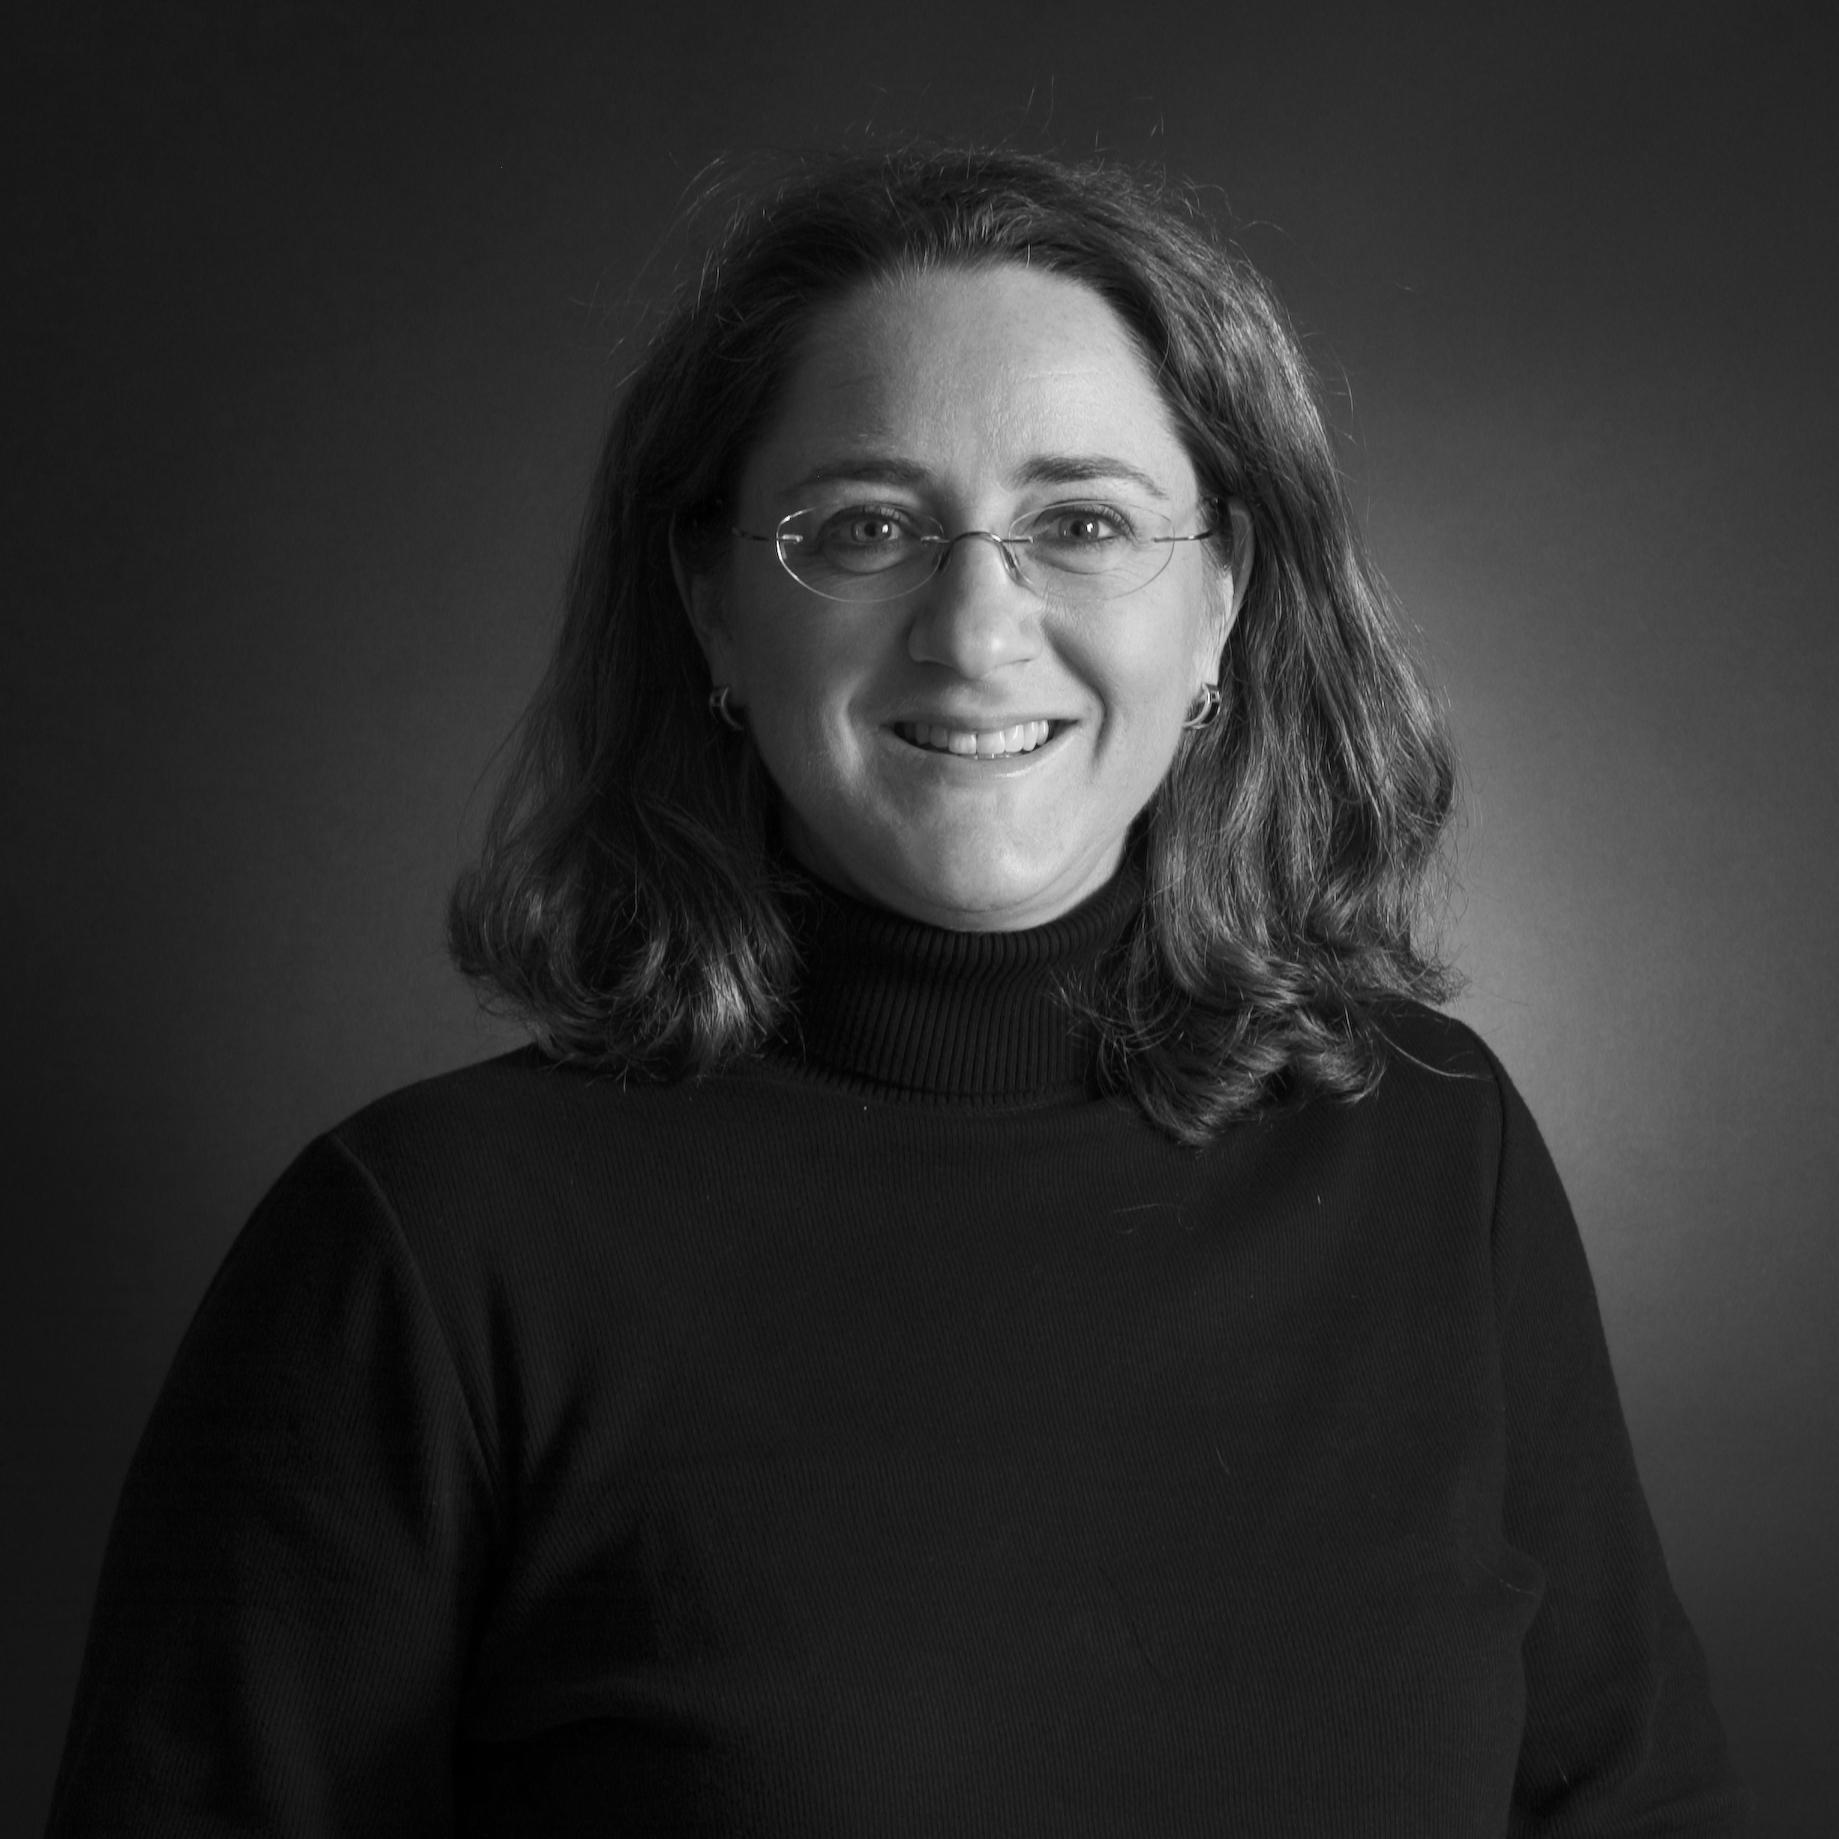 Dr. Dina Battisto